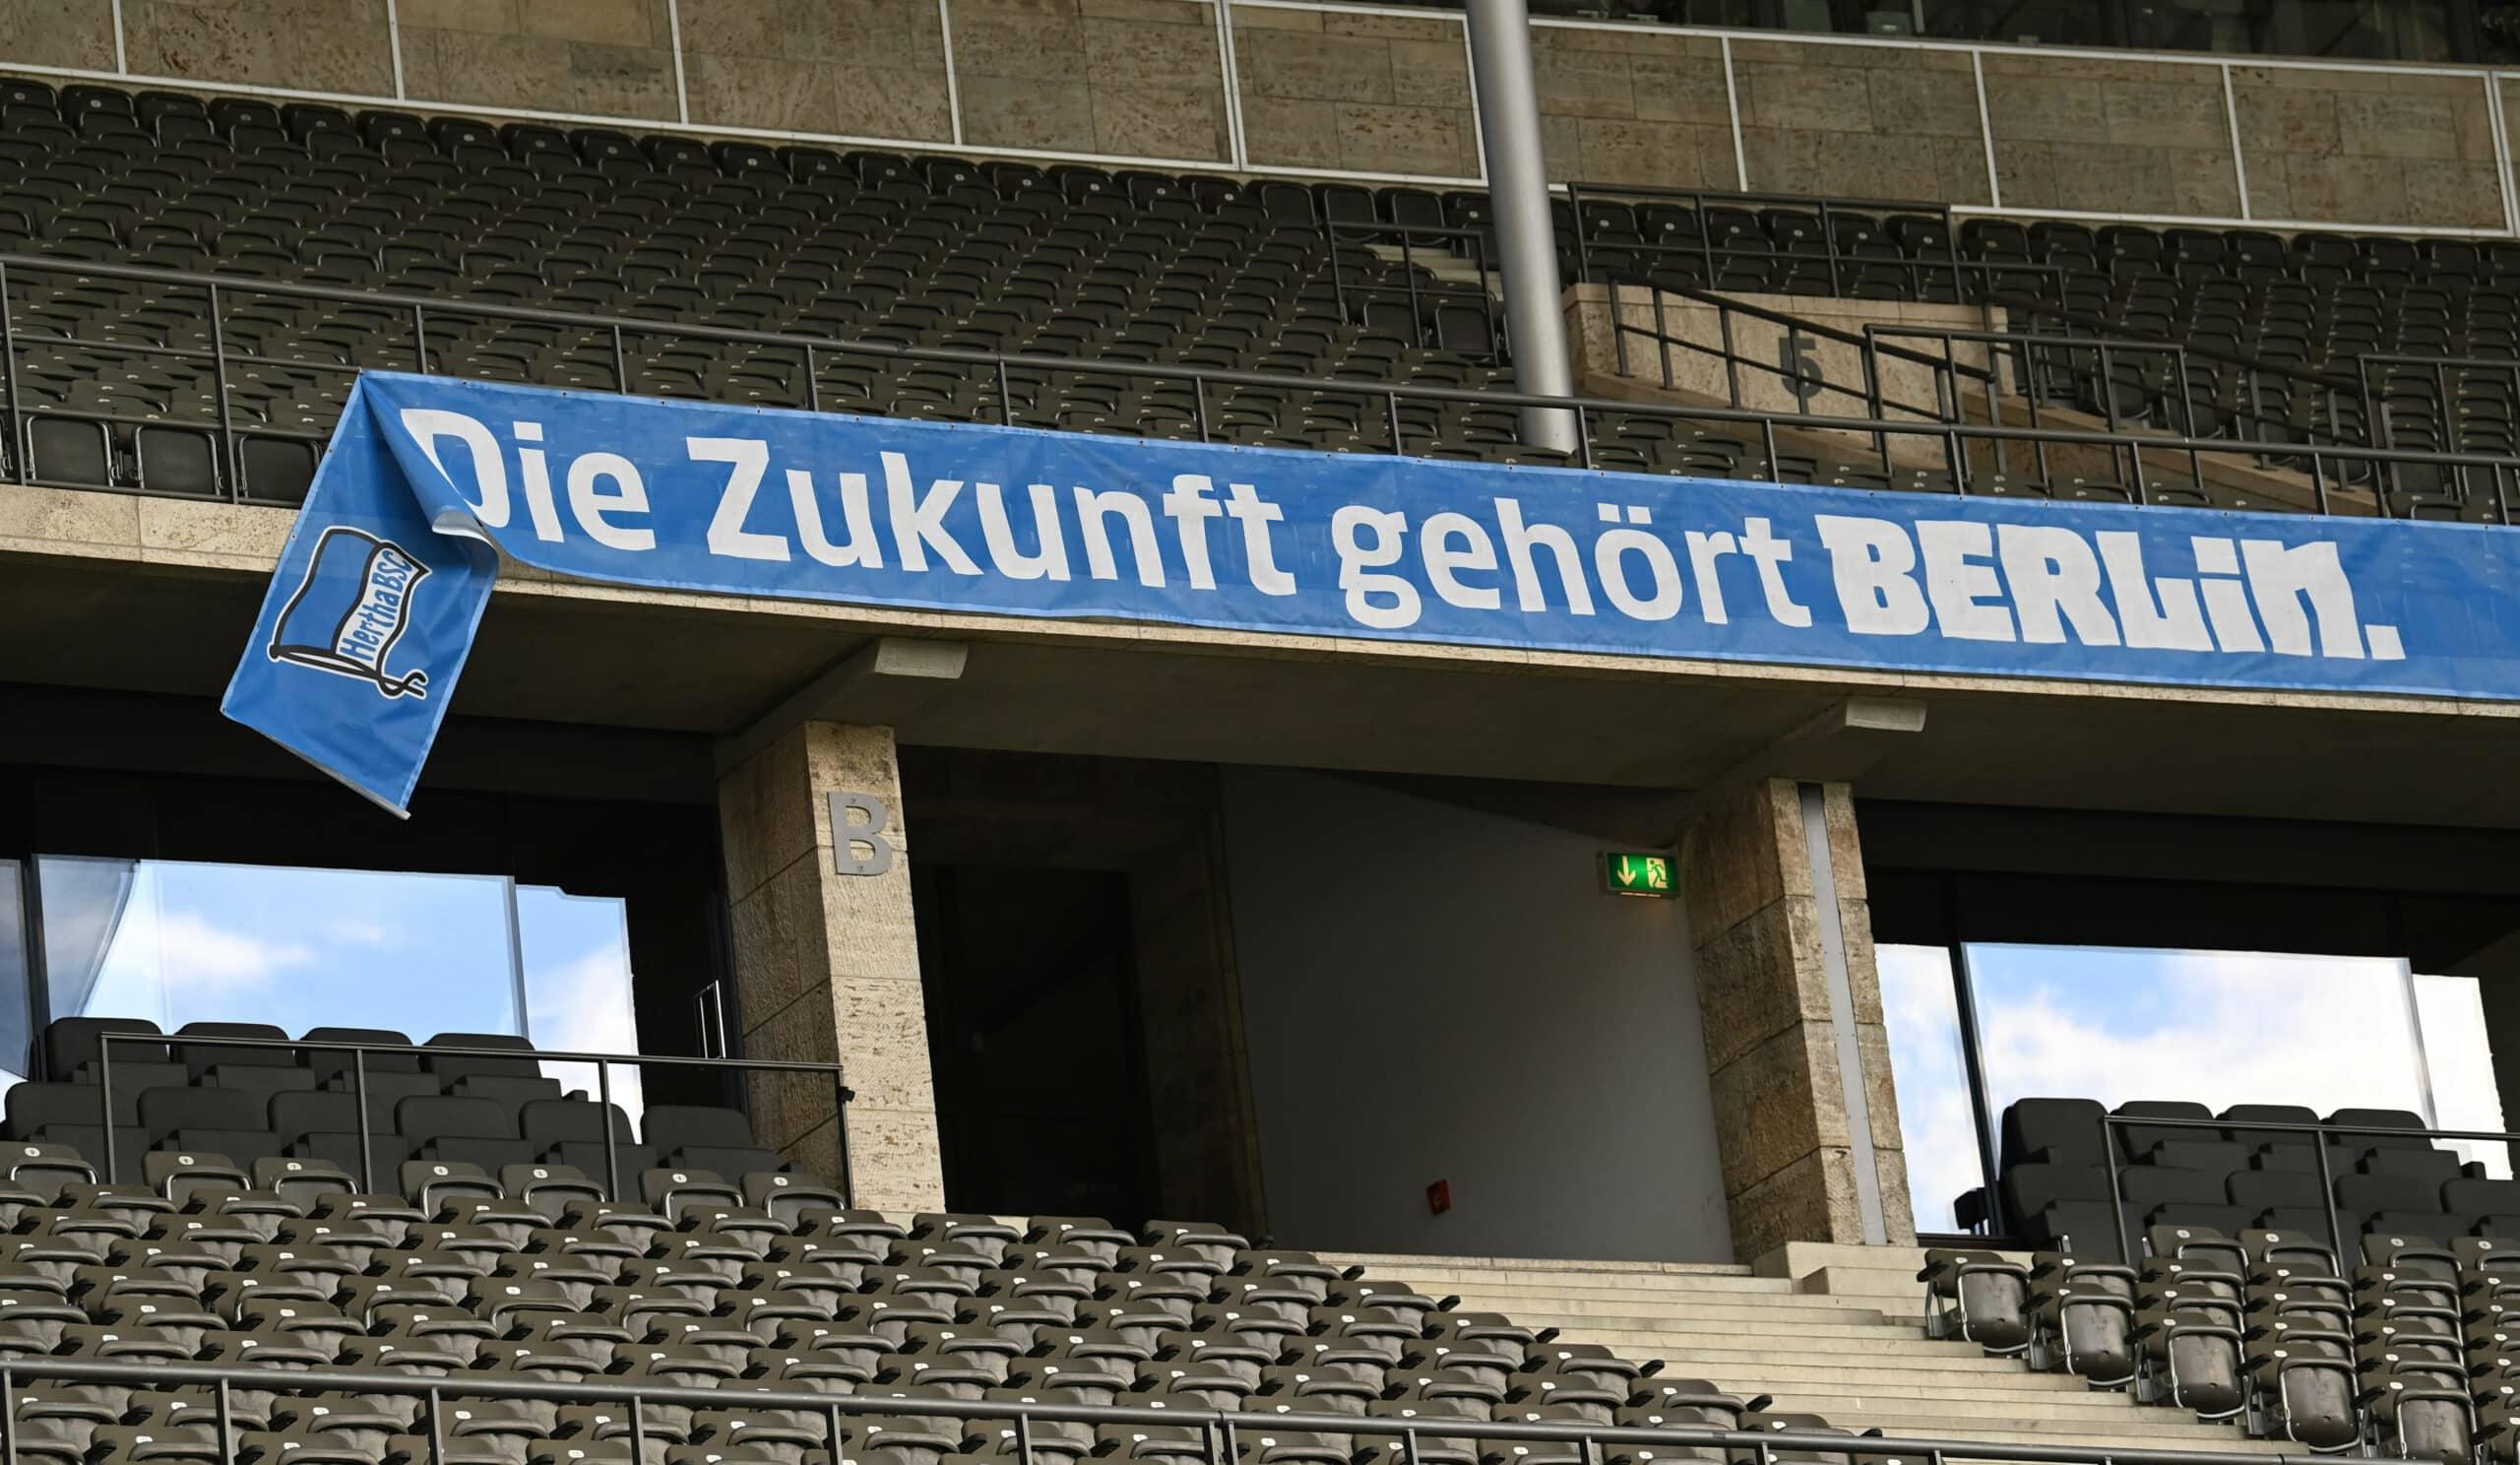 Windhorst hertha BSC